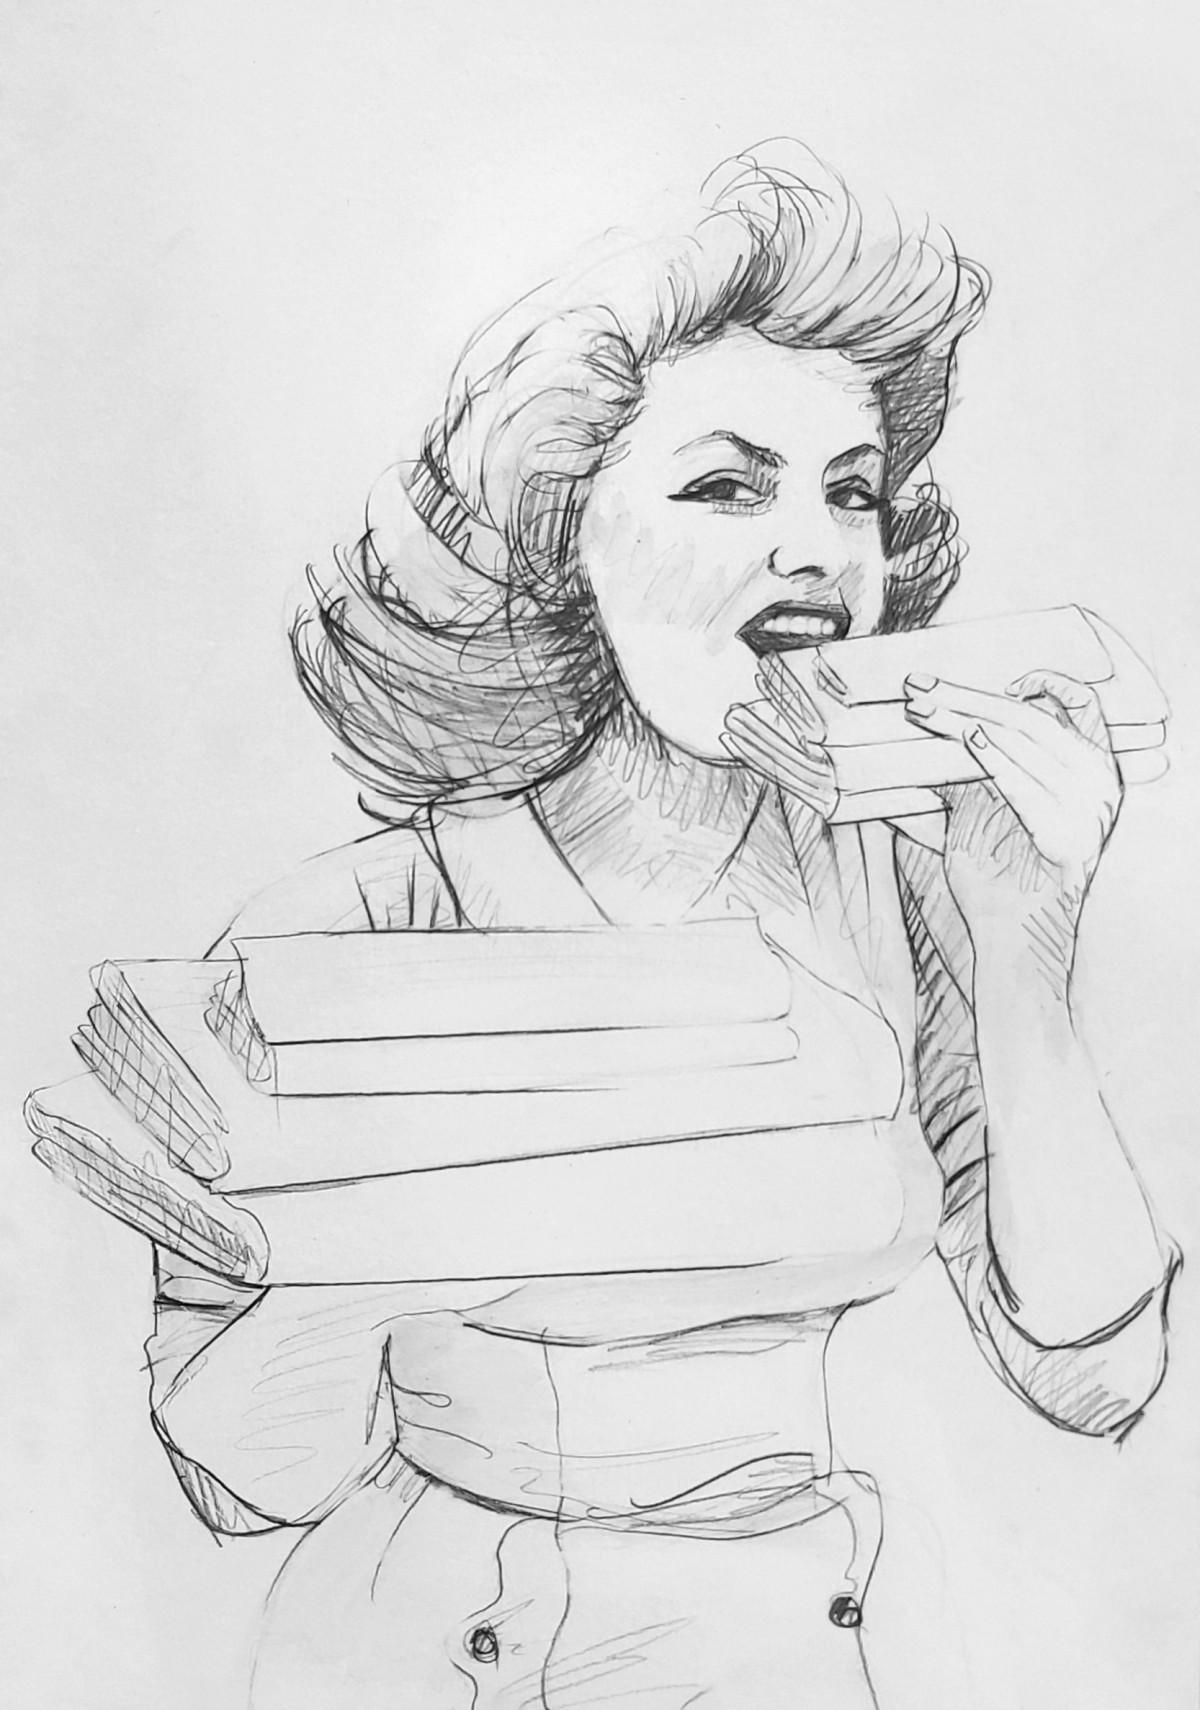 Il·lustracions: Bet Calderer / Text: Xavier Gonzàlez-Costa